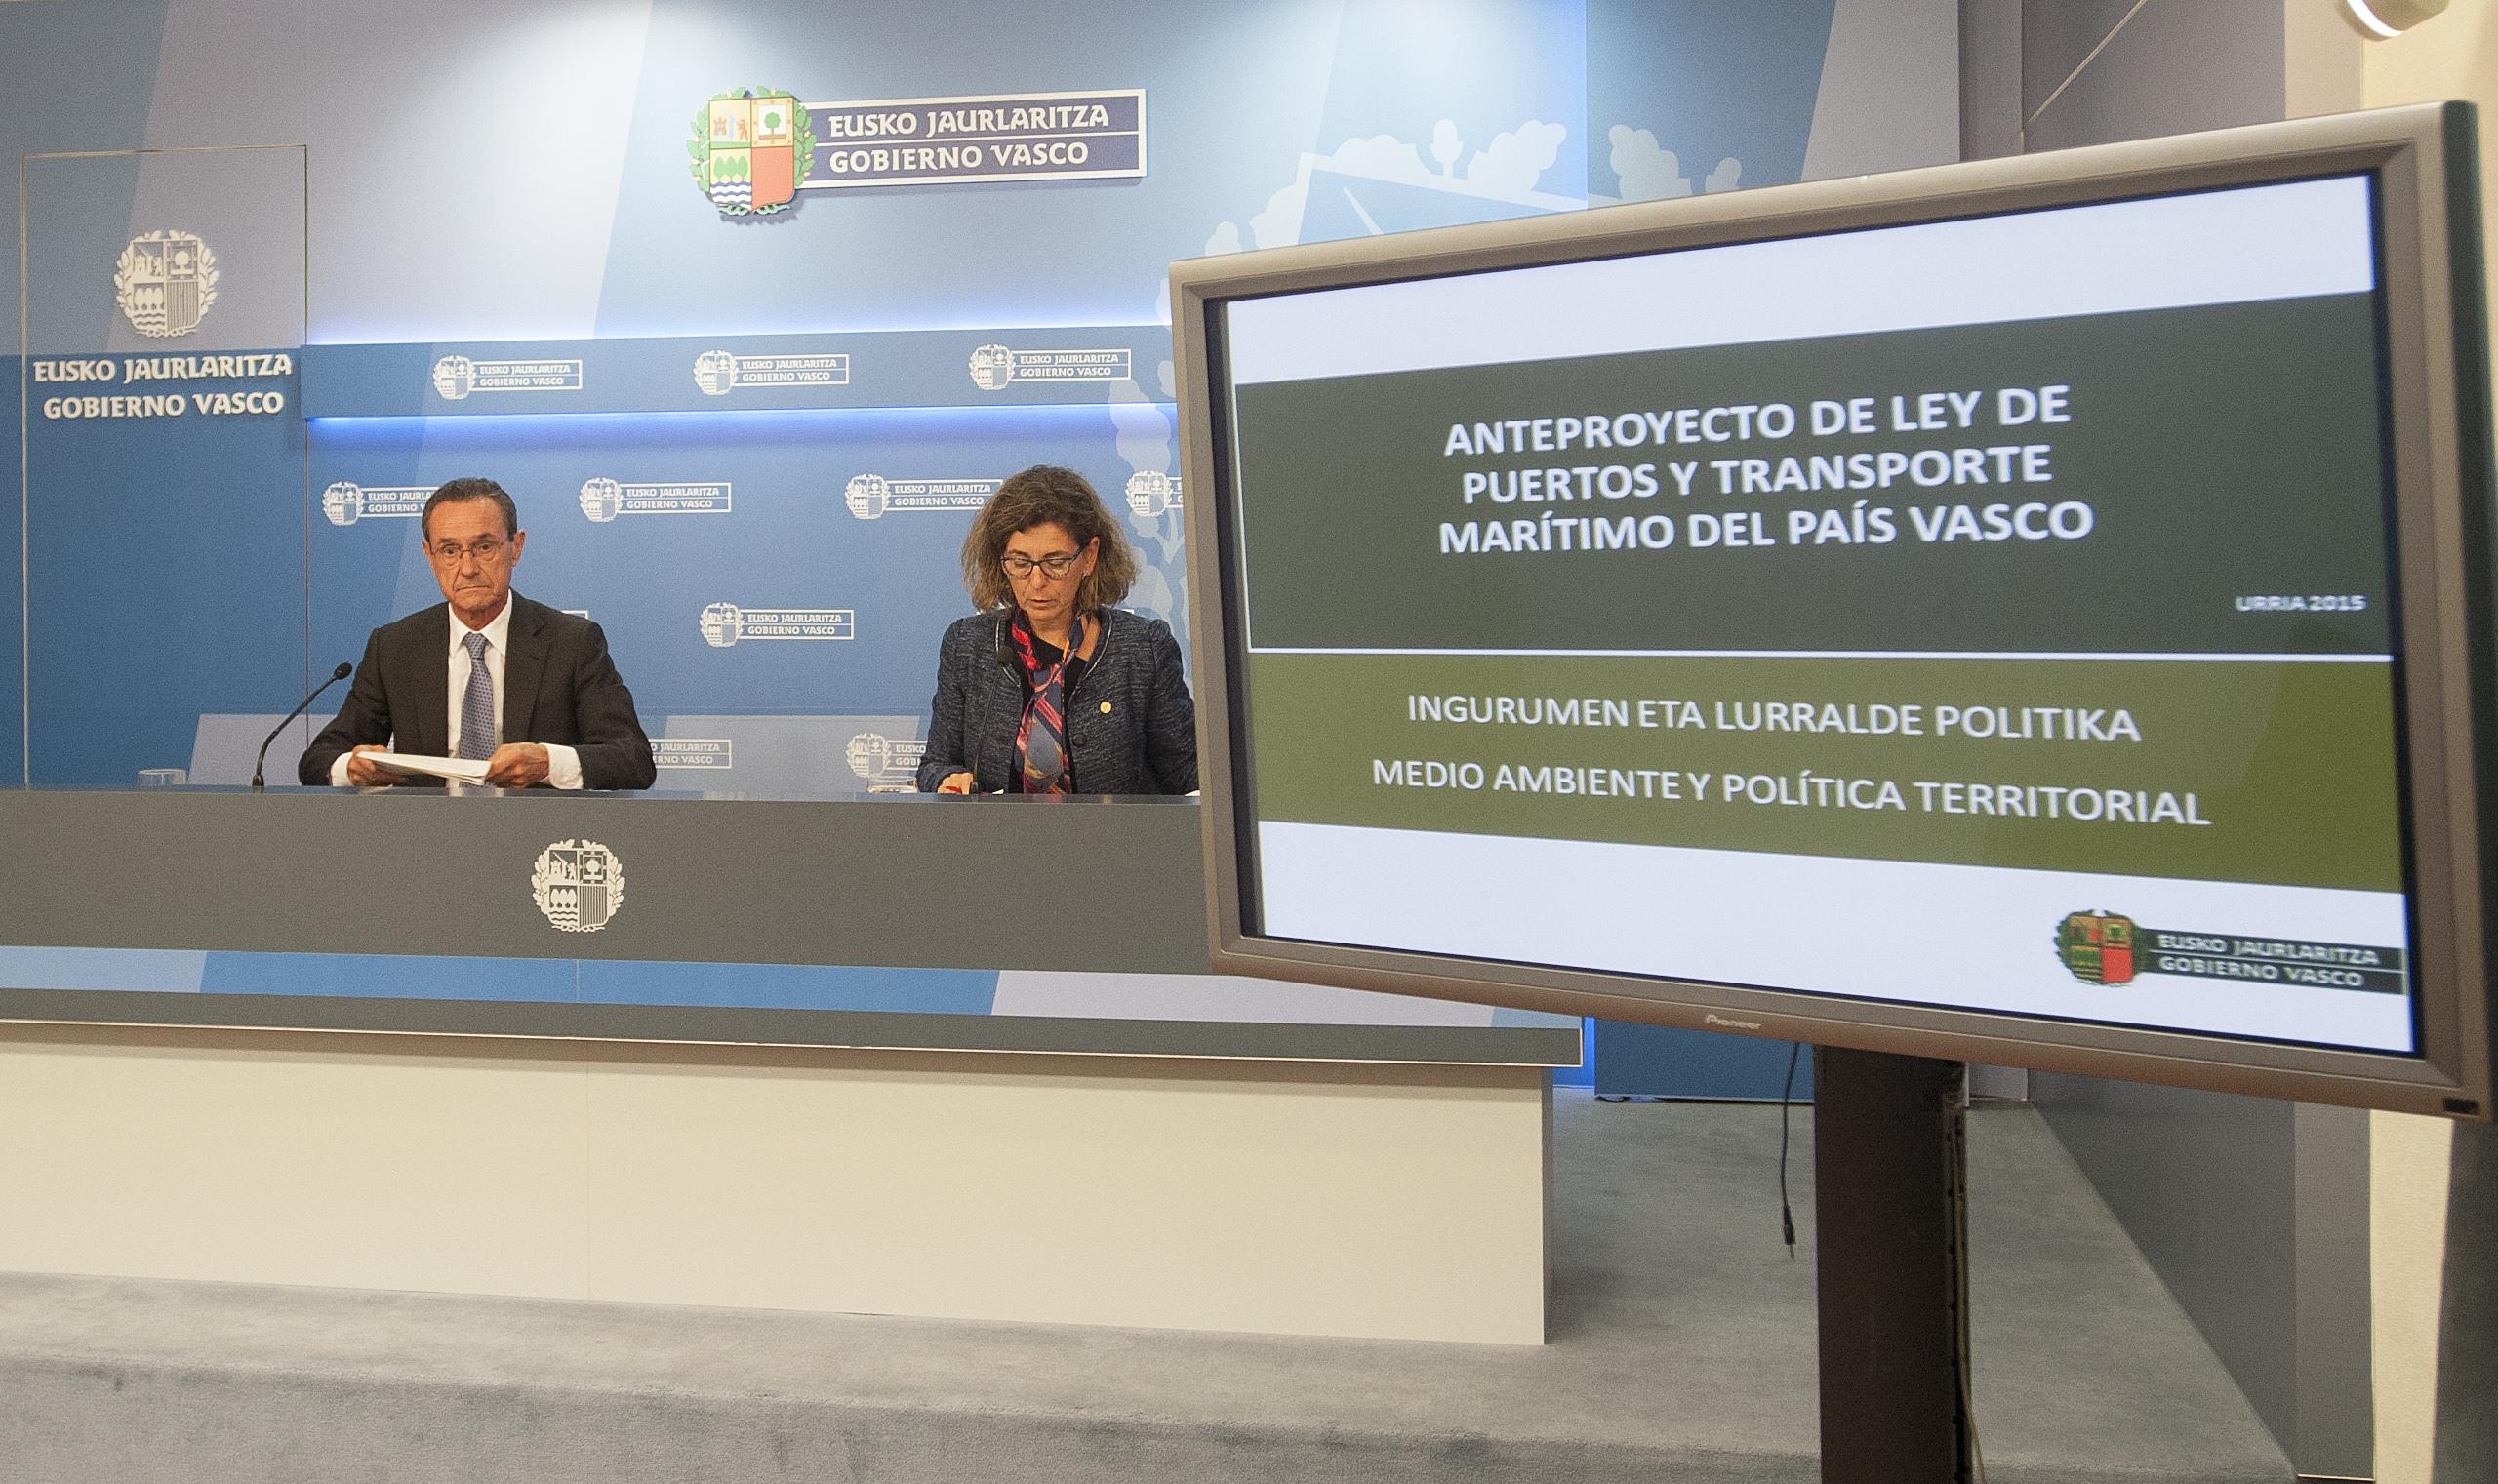 20151103_consejo_gobierno4.jpg